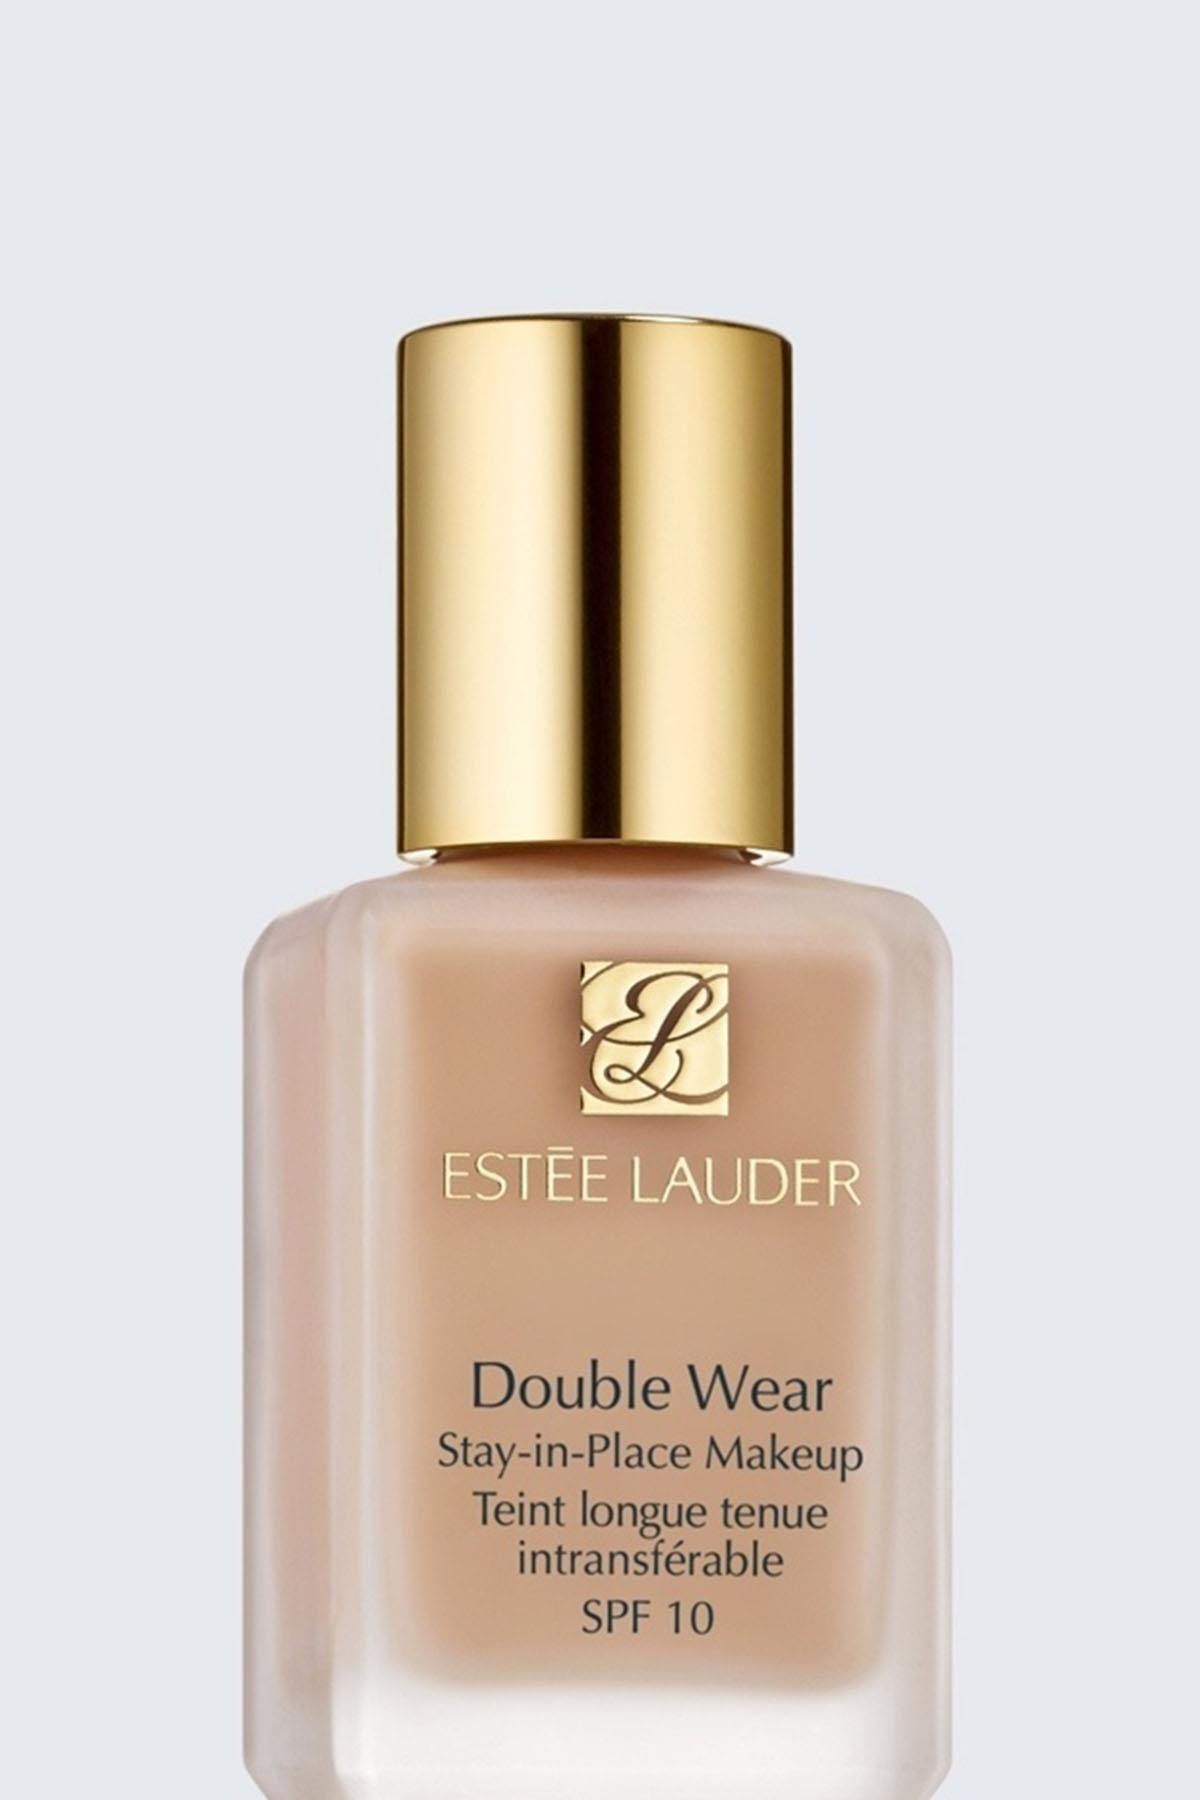 Estee Lauder Fondöten - Double Wear Foundation S.I.P Spf 10 1N2 Ecru 30 ml 027131392330 1